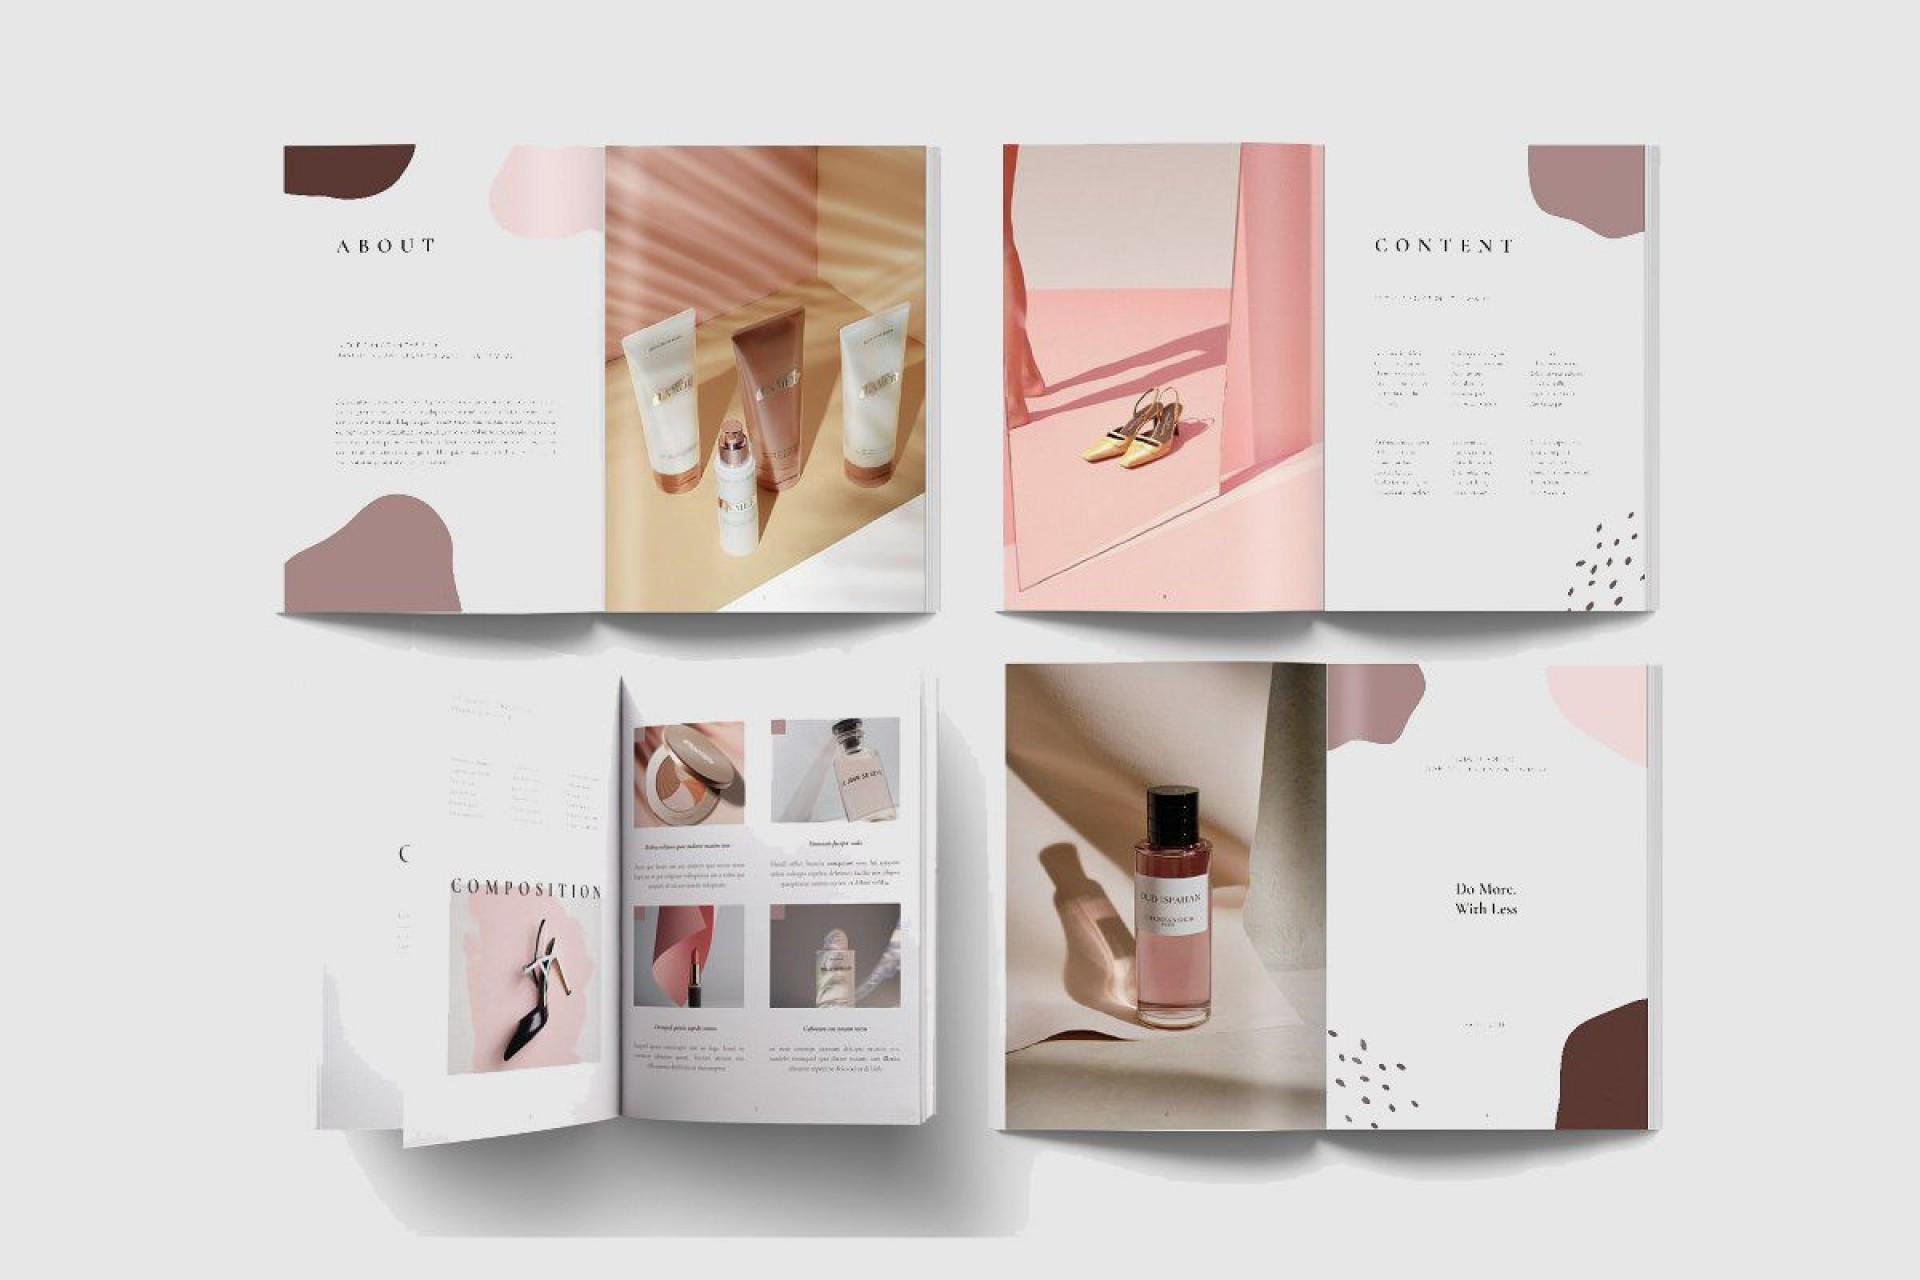 008 Impressive In Design Portfolio Template  Free Indesign A3 Photography Graphic Download1920